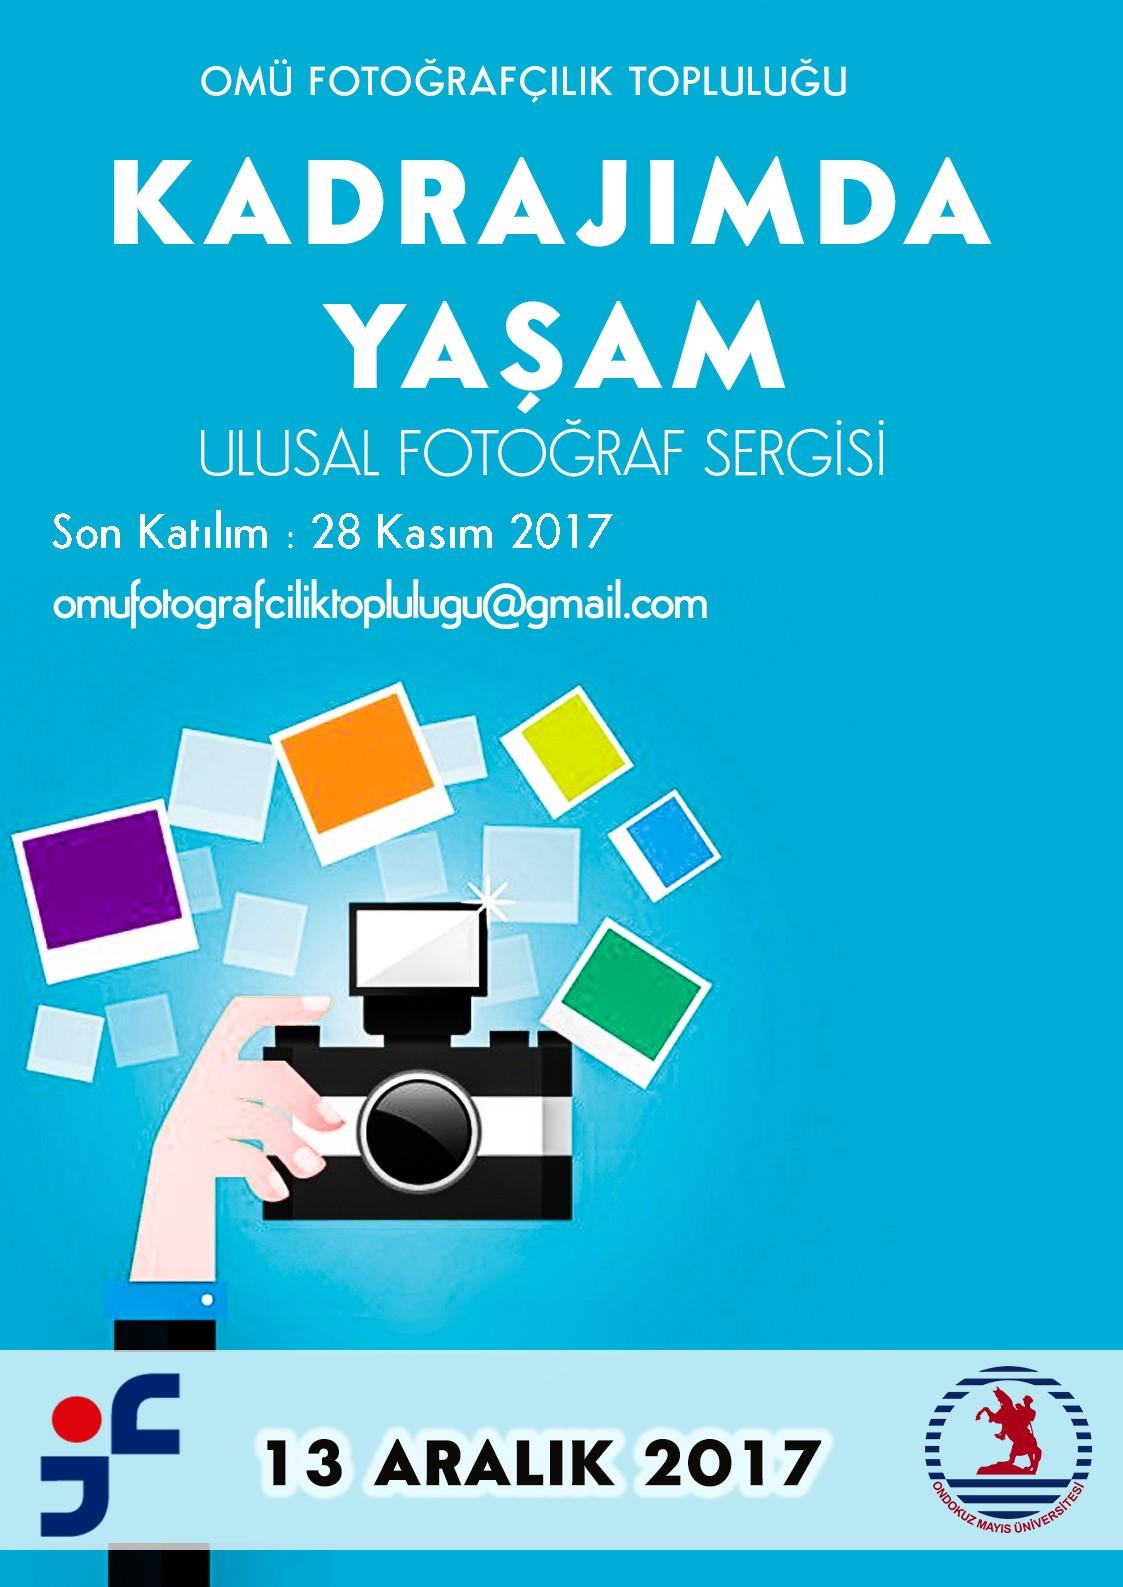 http://www.omu.edu.tr/sites/default/files/kadrajimda_yasam_ulusal_fotograf_sergisi.jpg